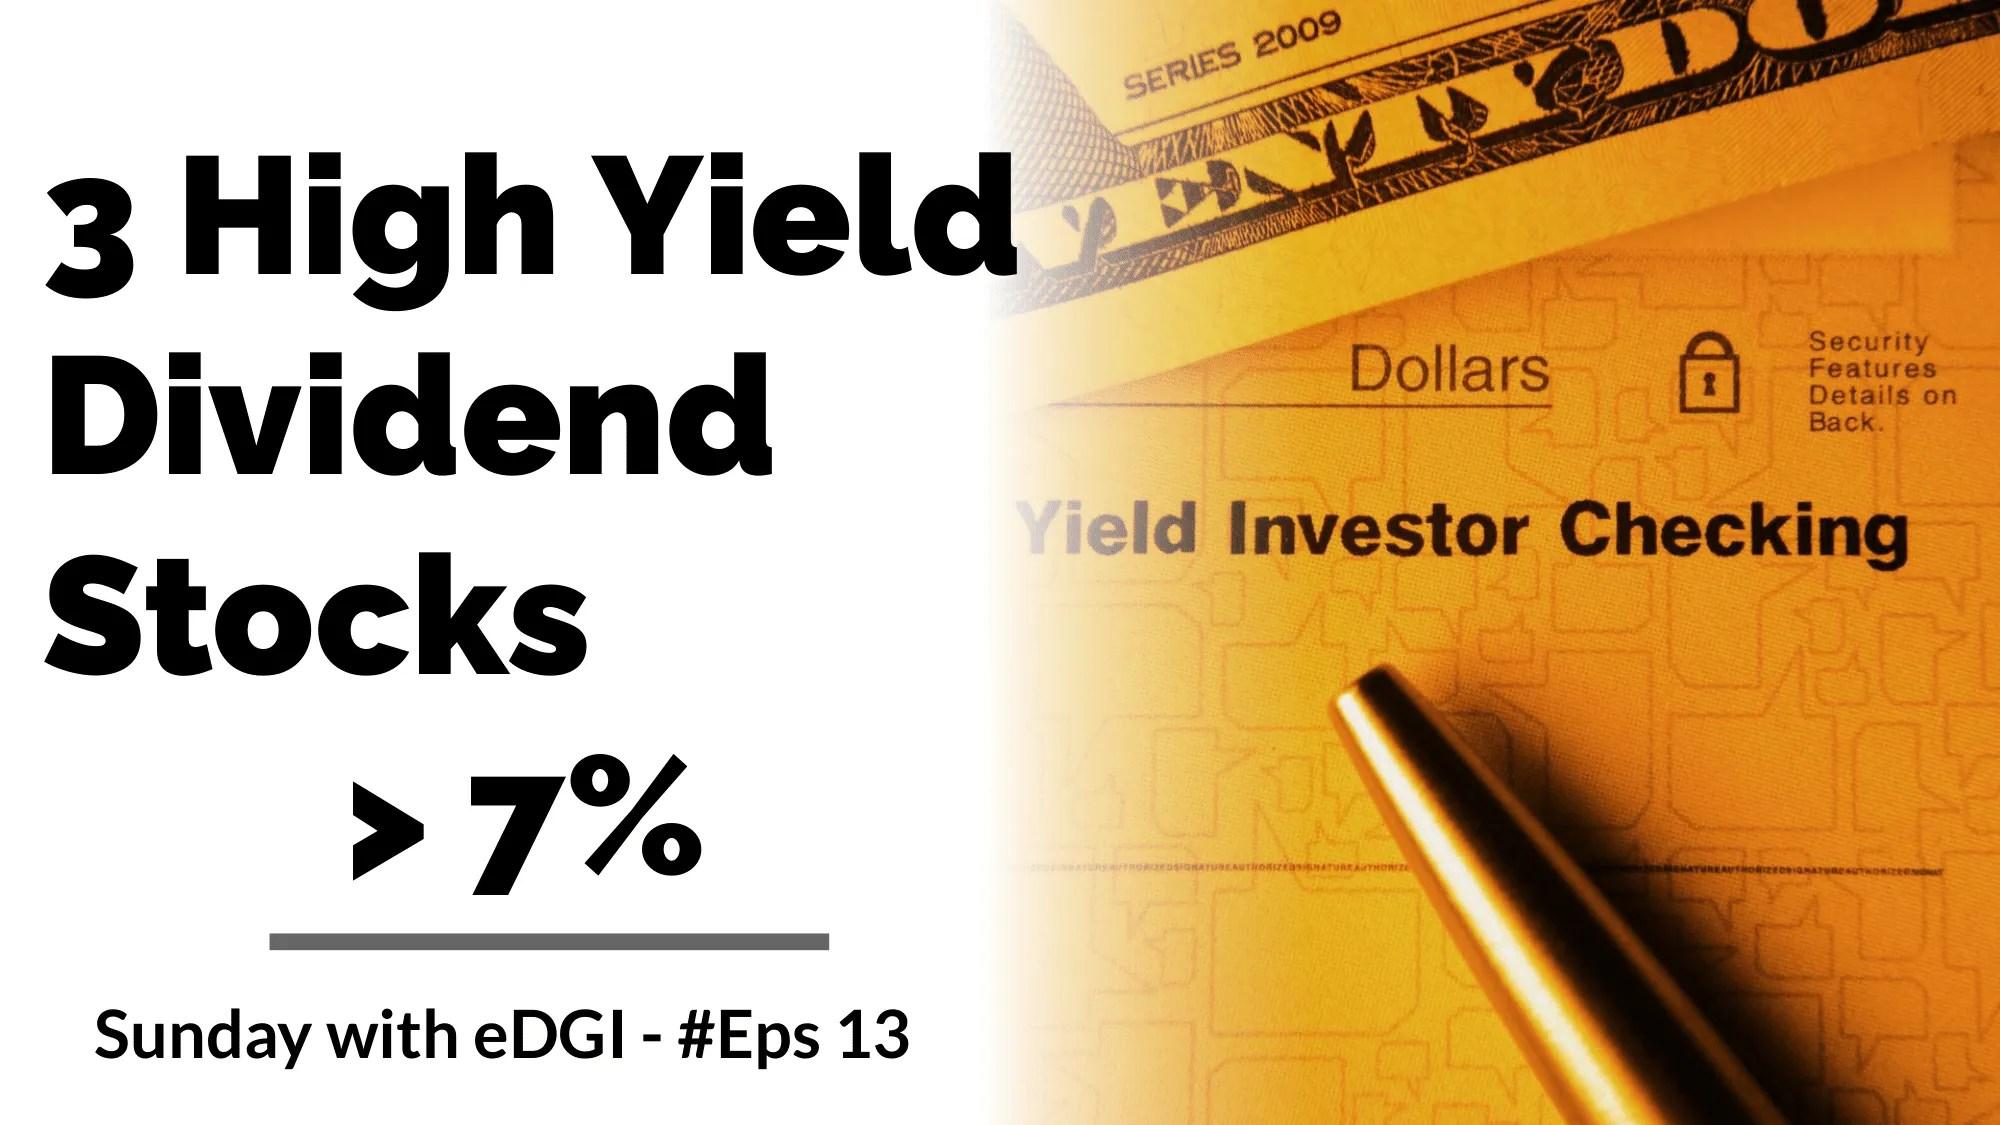 3 High Yield Stocks